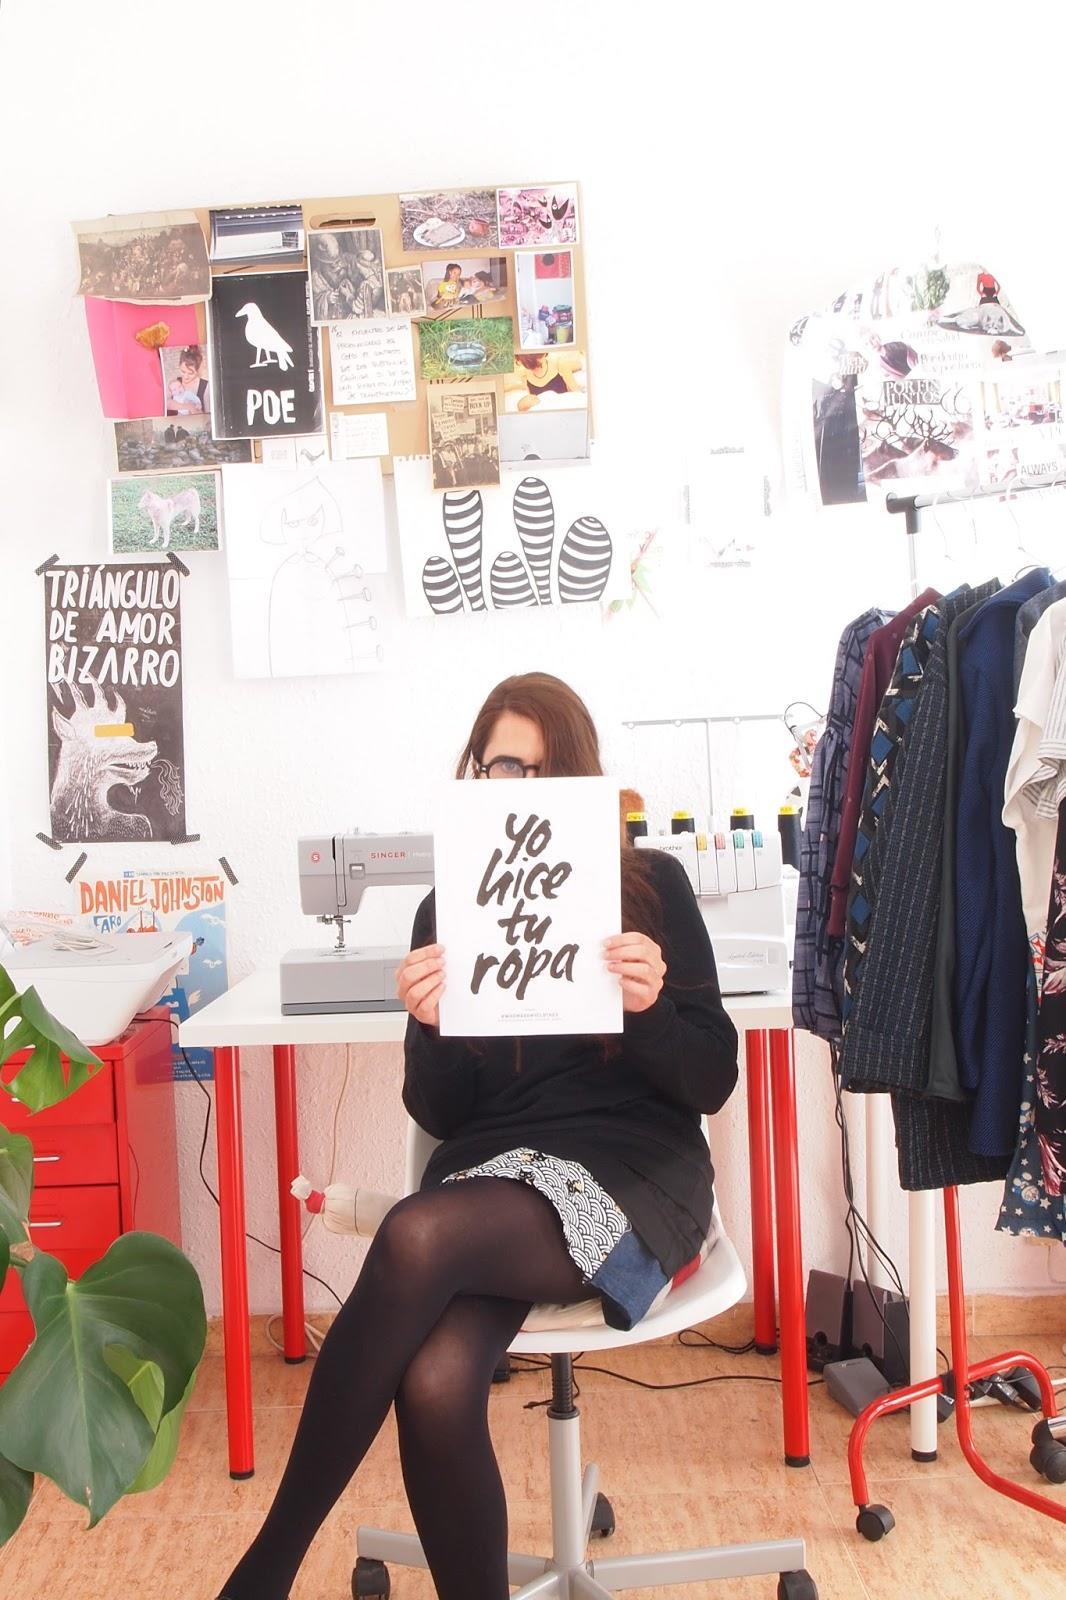 FashionRevolution, Slowfashion, Moda con Conciencia, Costura, Handmade